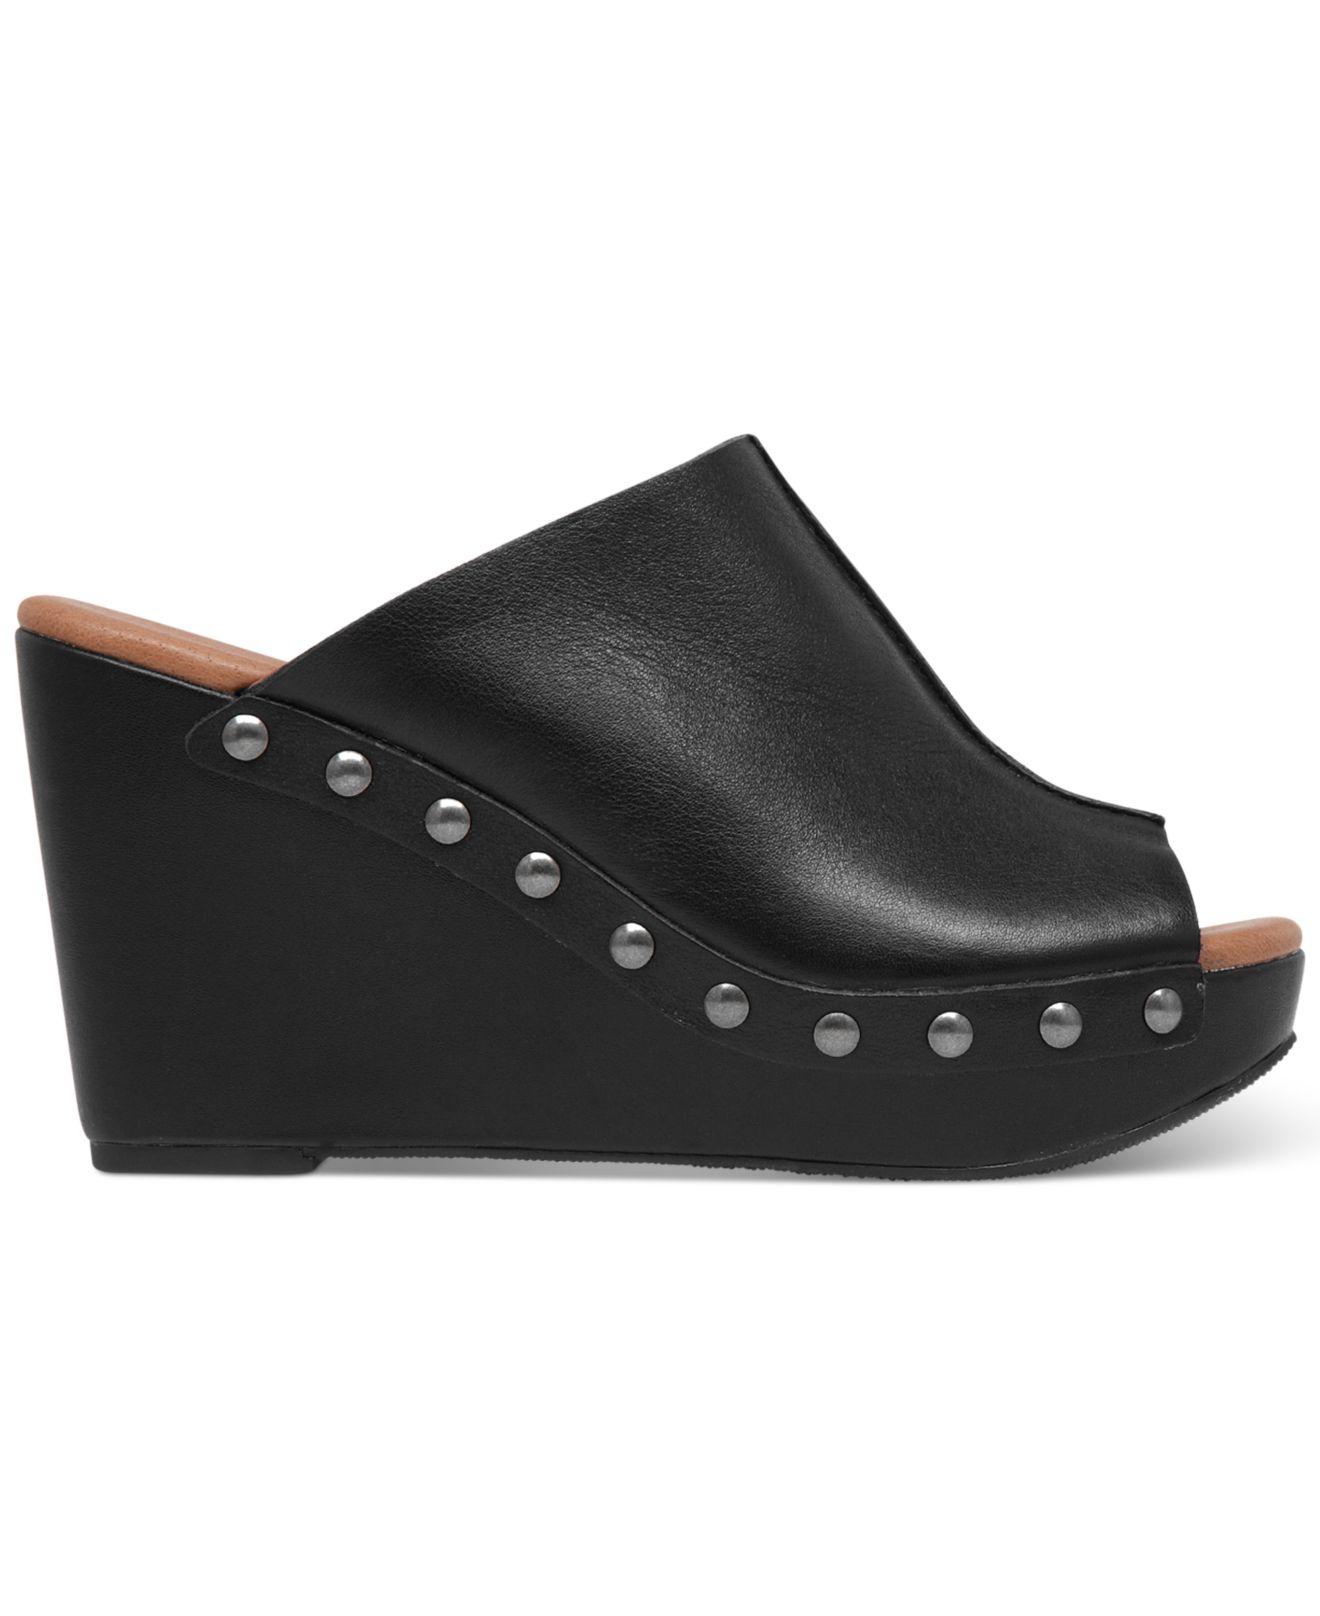 9898c70d8e Lucky Brand Women'S Malayah Platform Wedge Slide Sandals in Black - Lyst